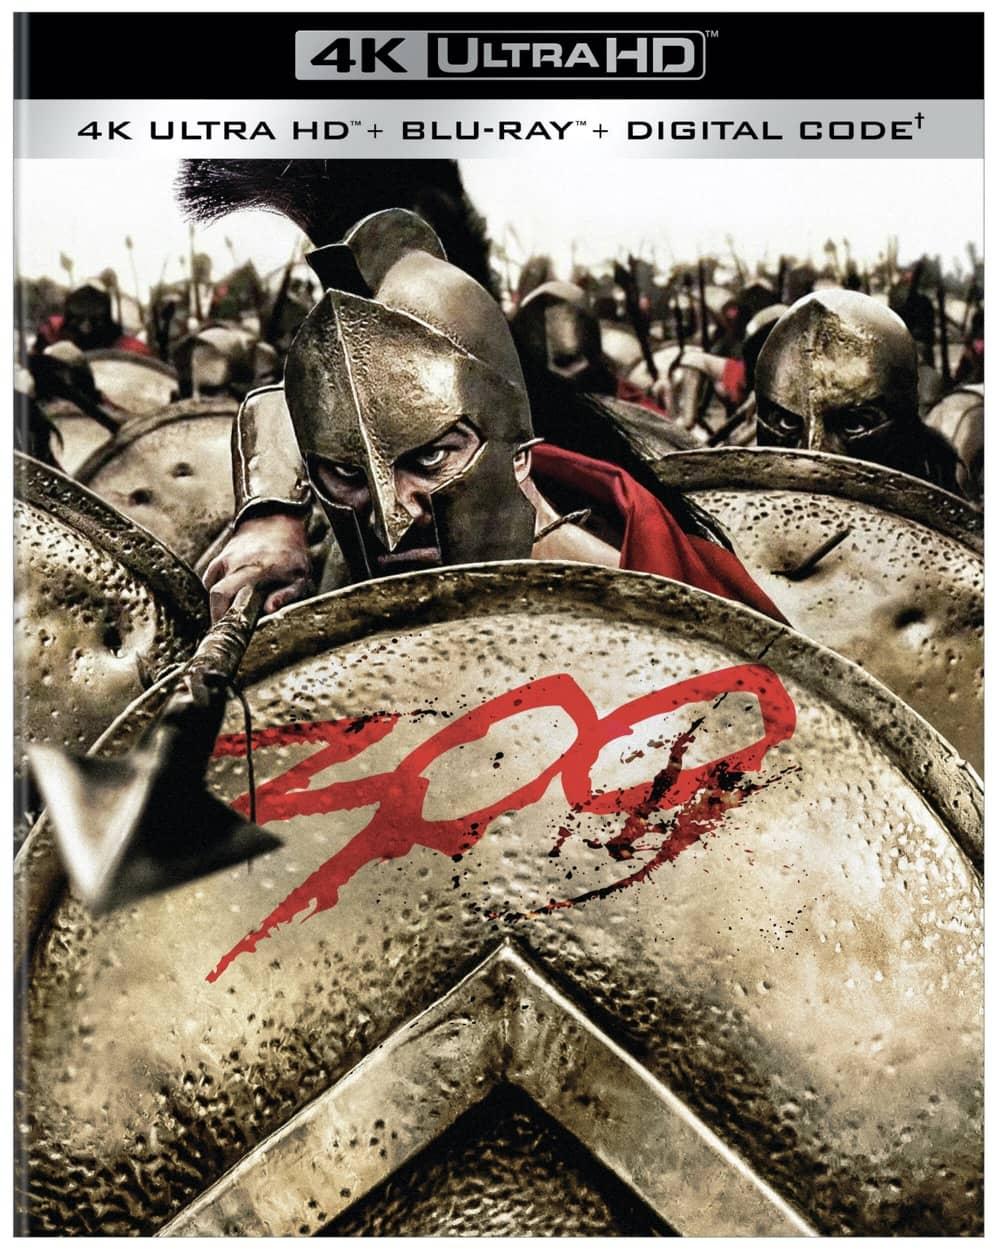 300 4K Ultra HD Box Art